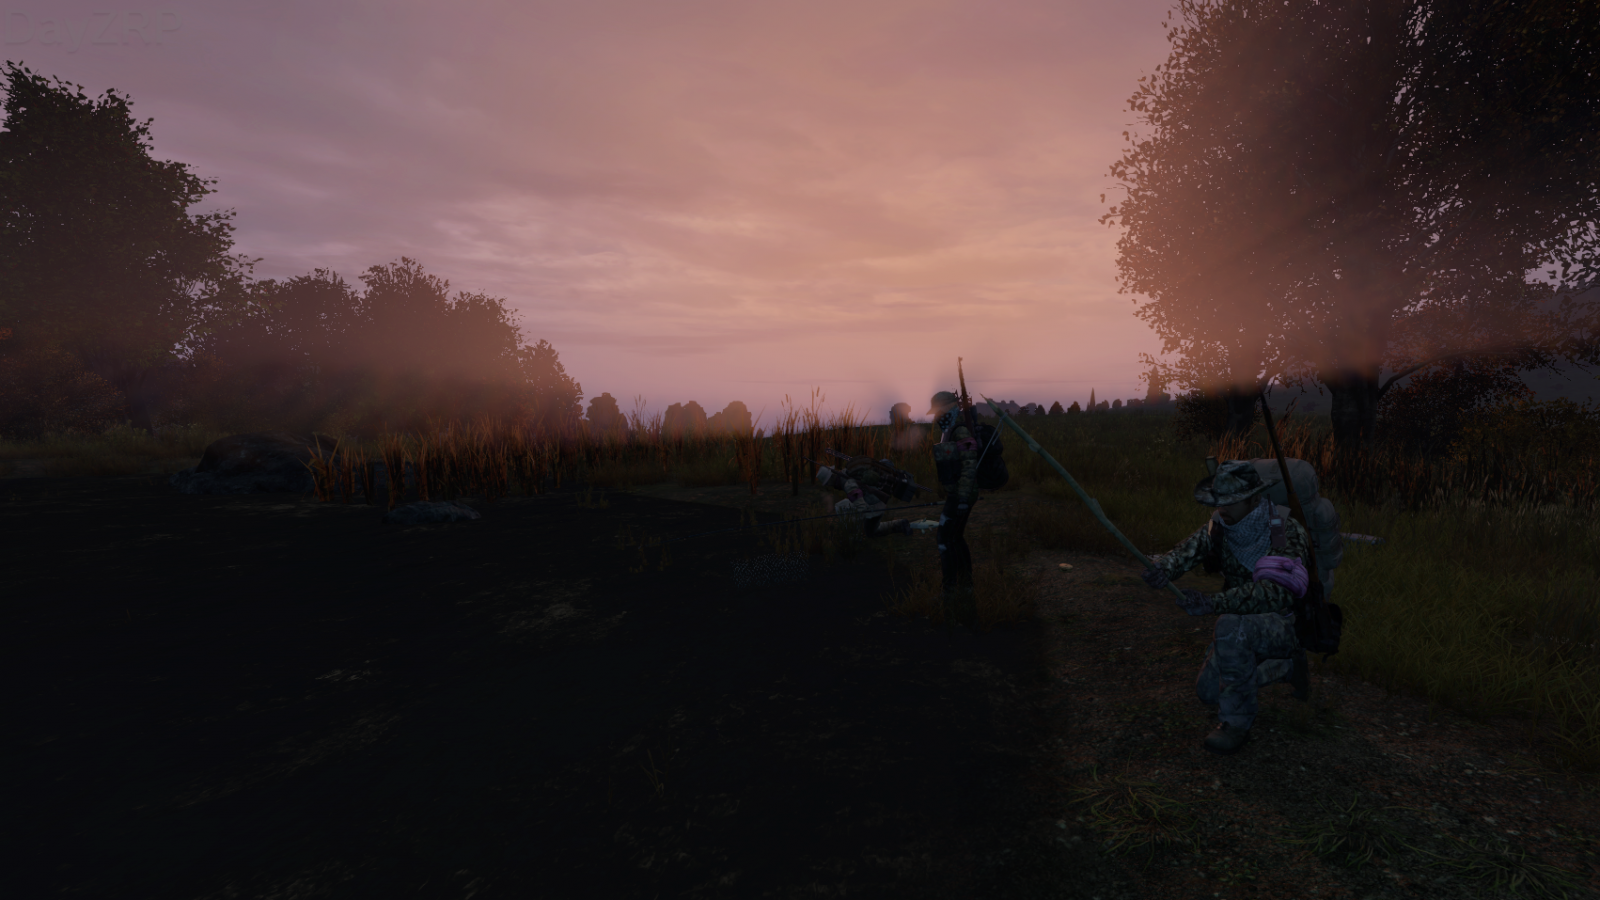 Late night/early morning fishing trip